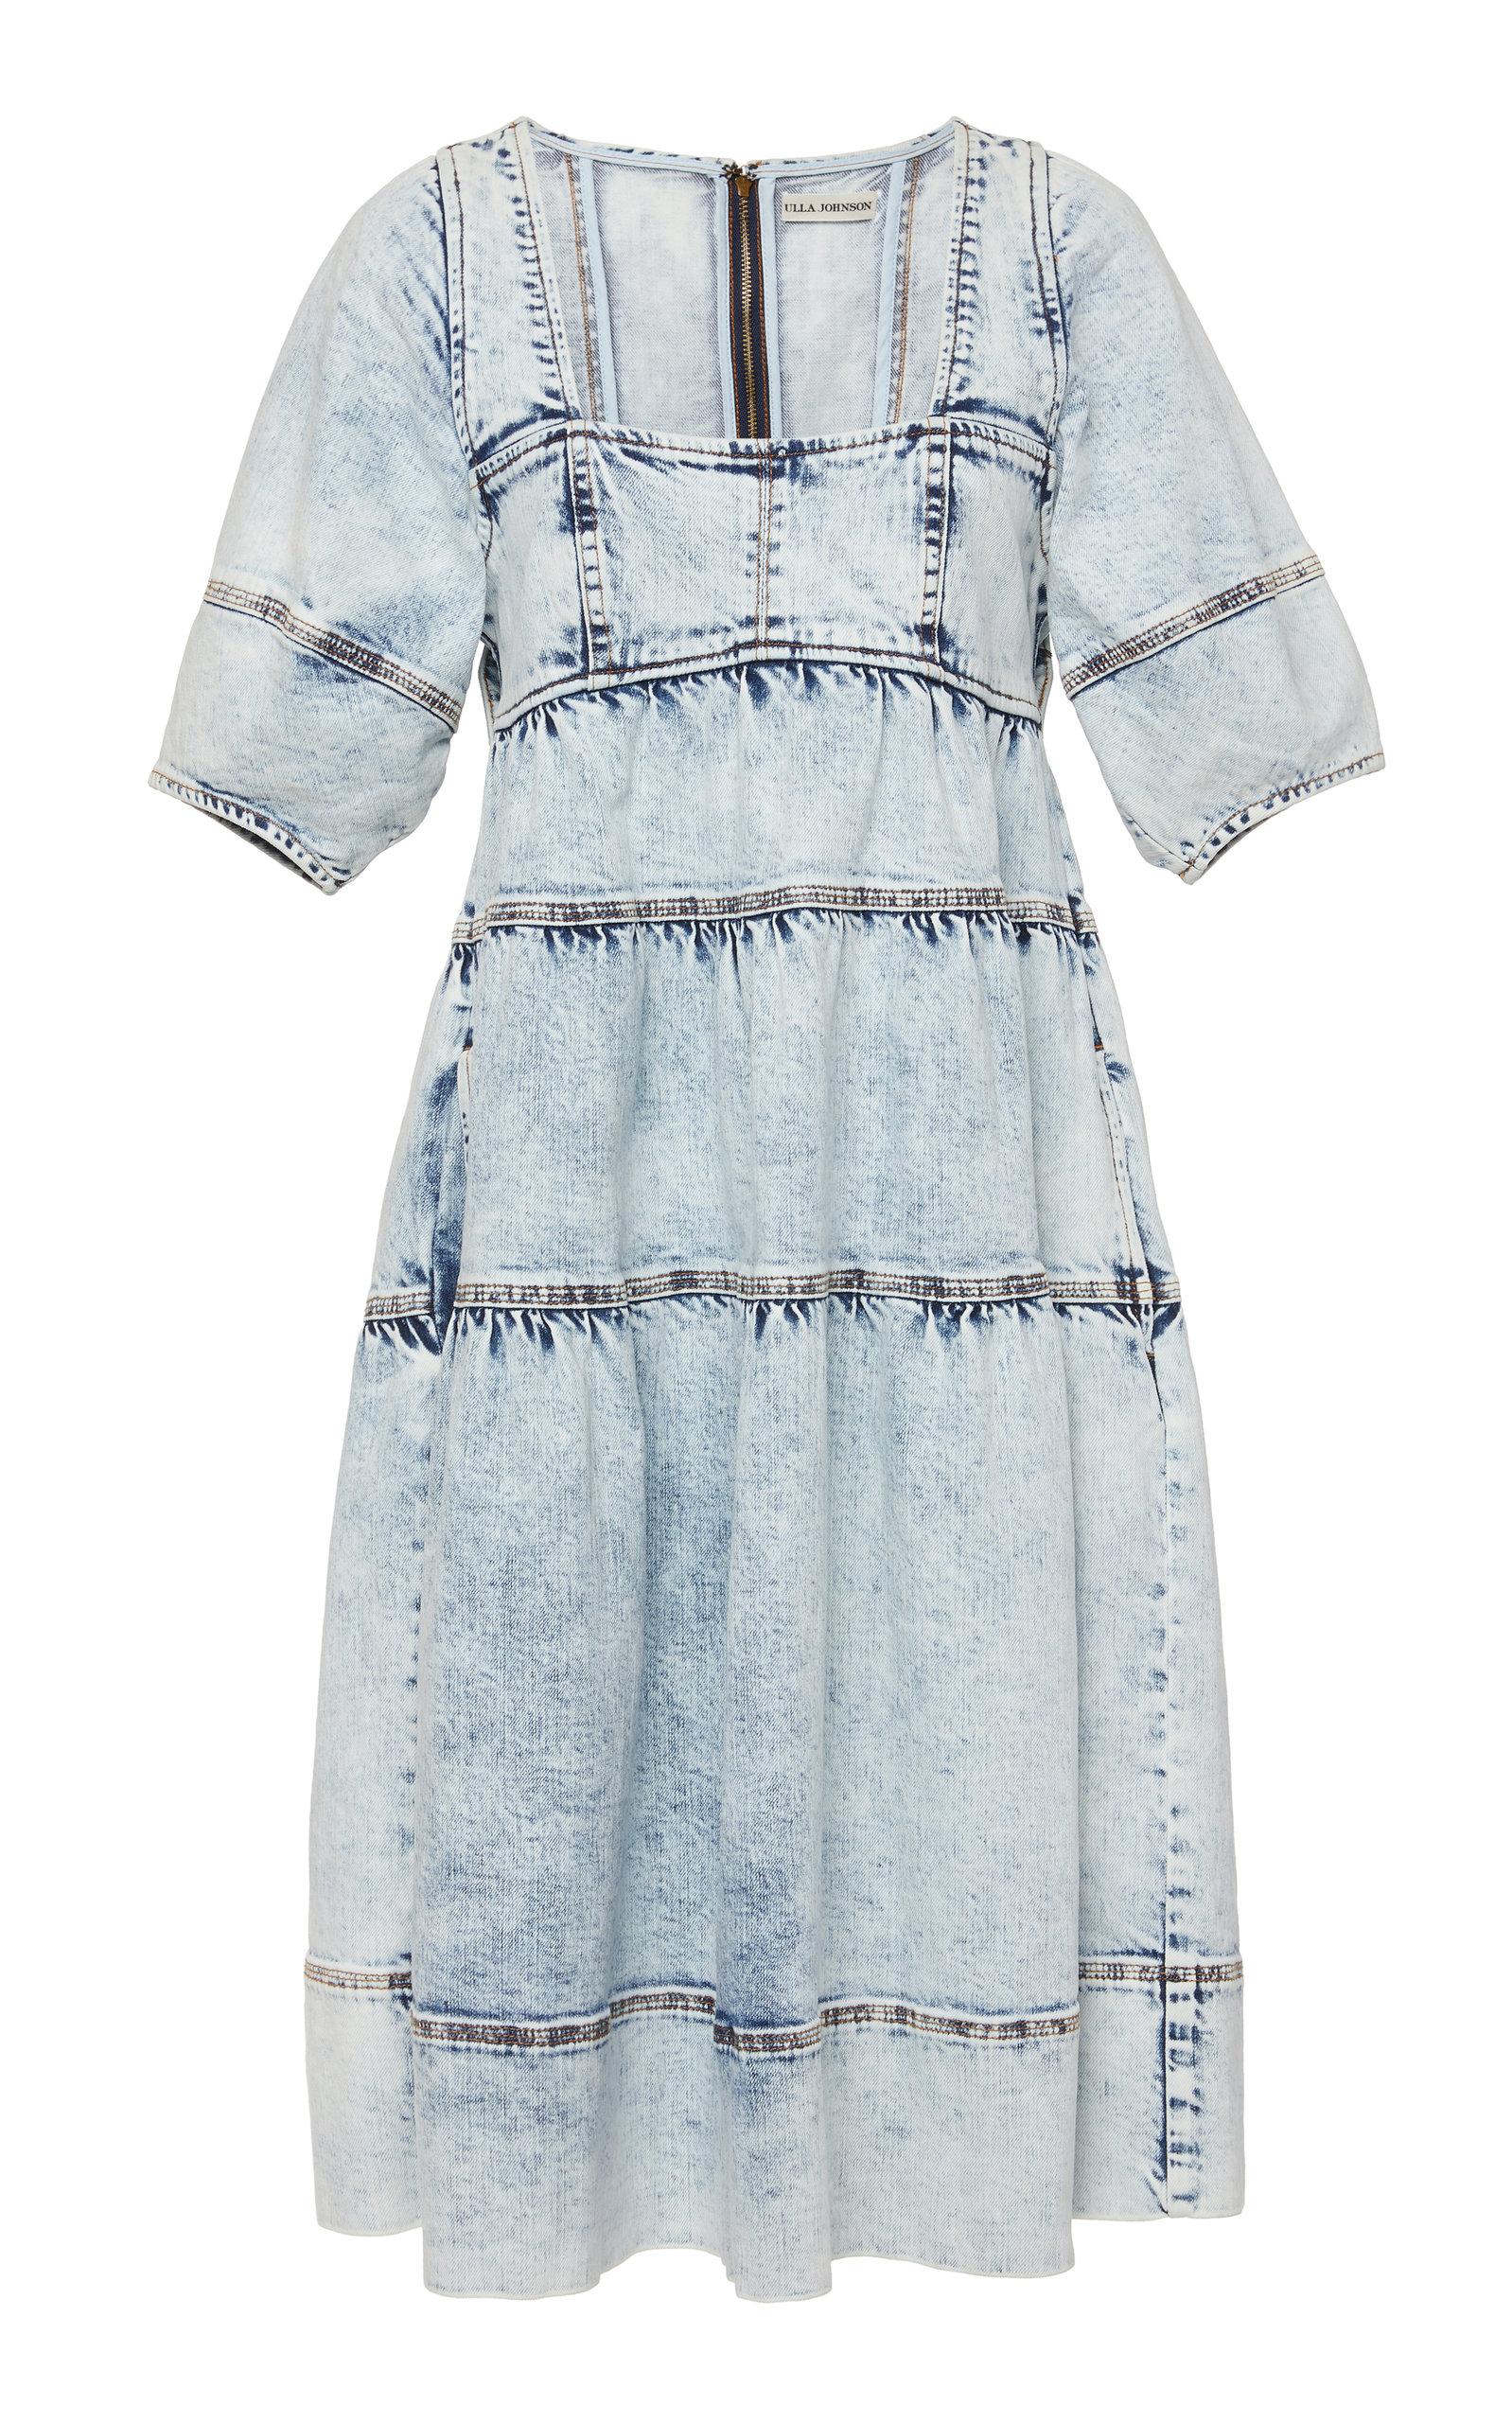 Devi Denim Midi Dress in Light Wash